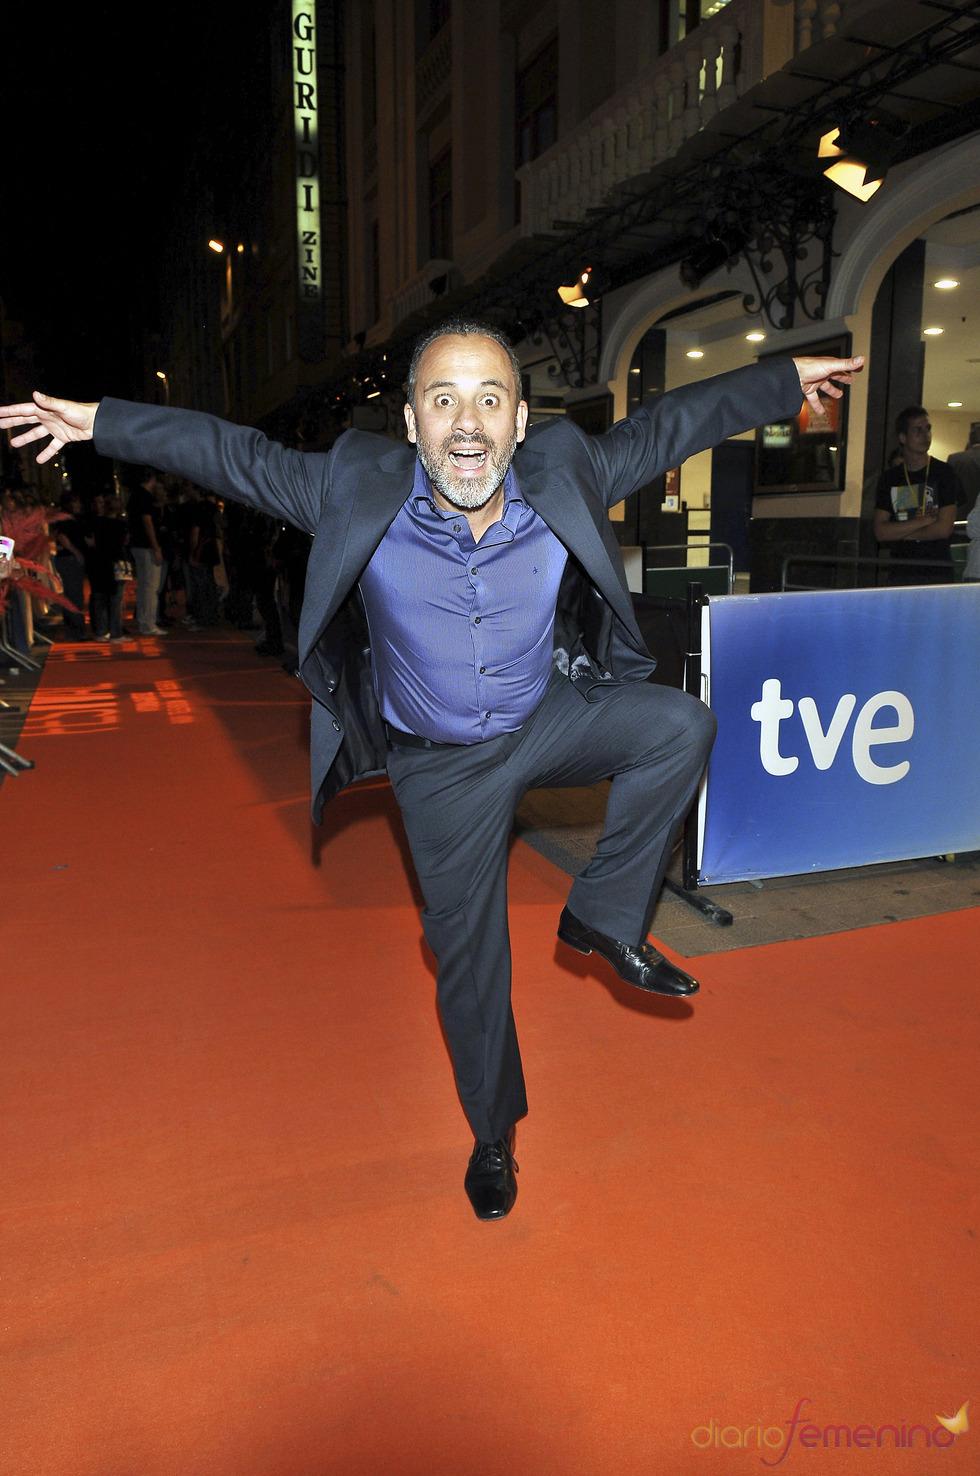 Javier Gutiérrez, todo un luchador profesional